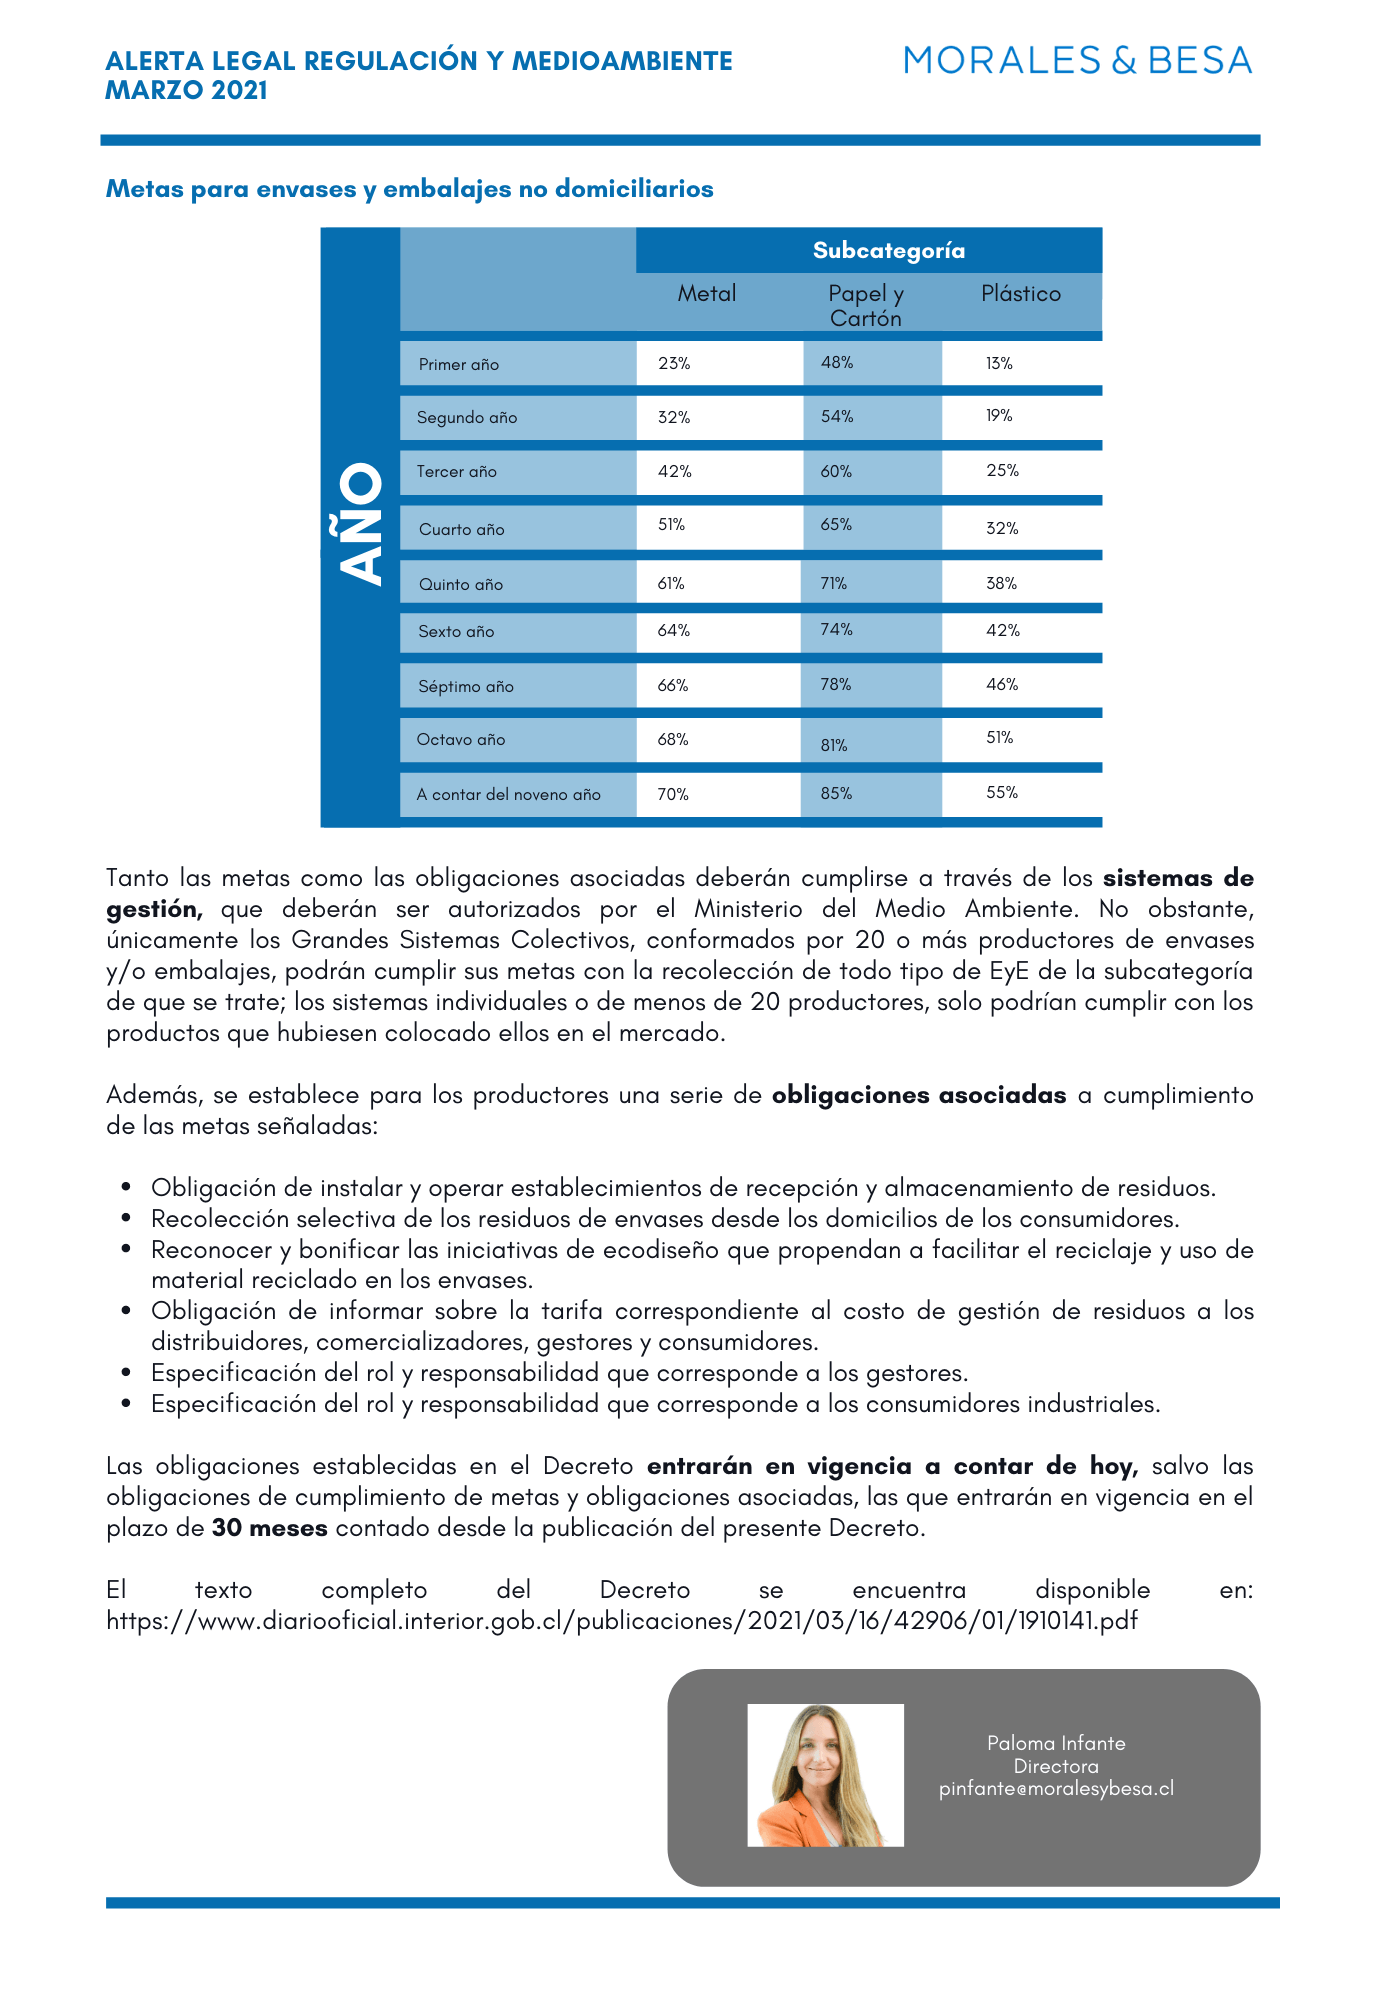 Alerta Legal M&B - Ley Rep (4)